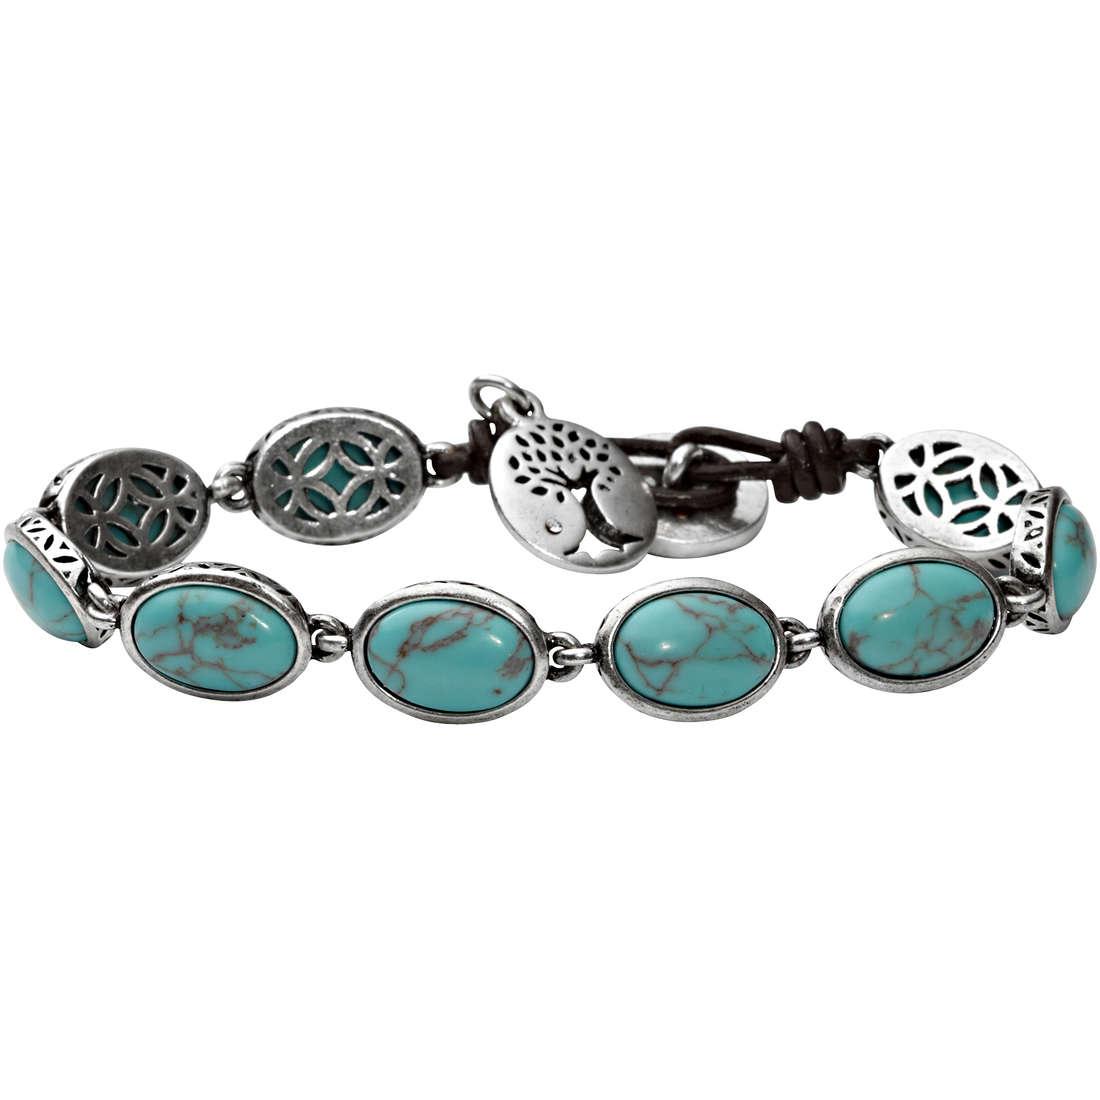 bracelet woman jewellery Fossil JA4465040